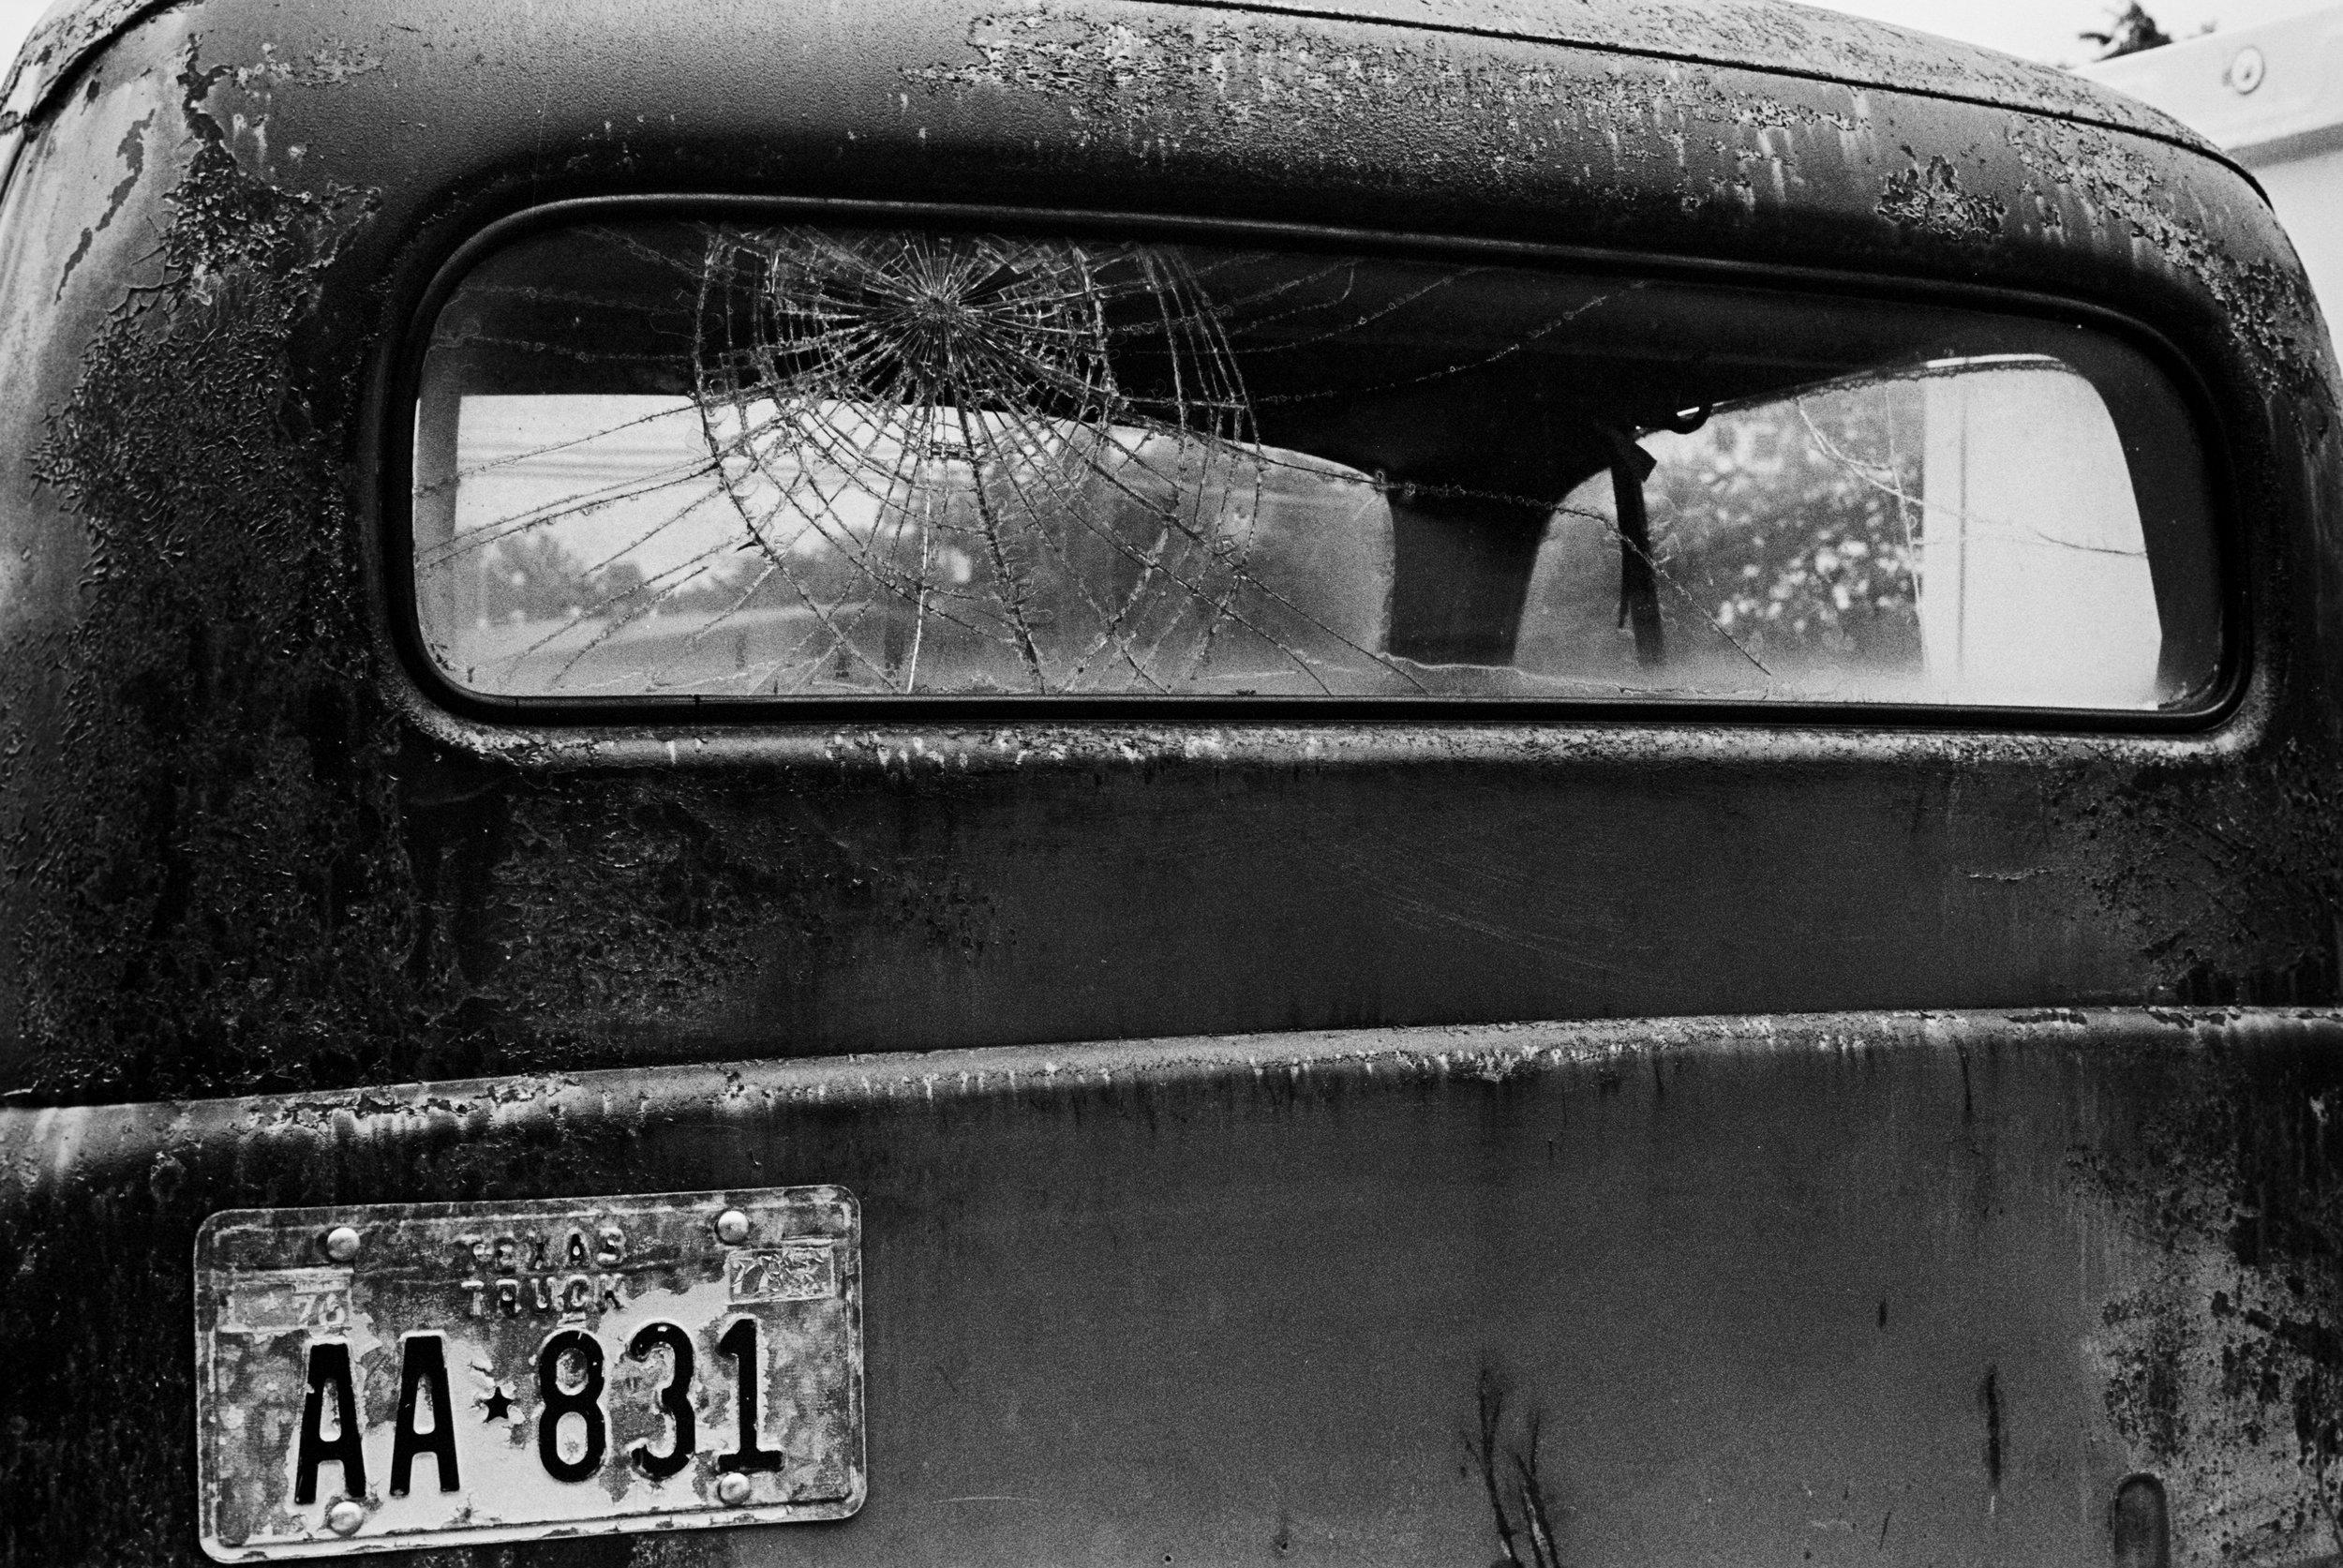 car-show-little-longhorn-saloon-2015-020.jpg